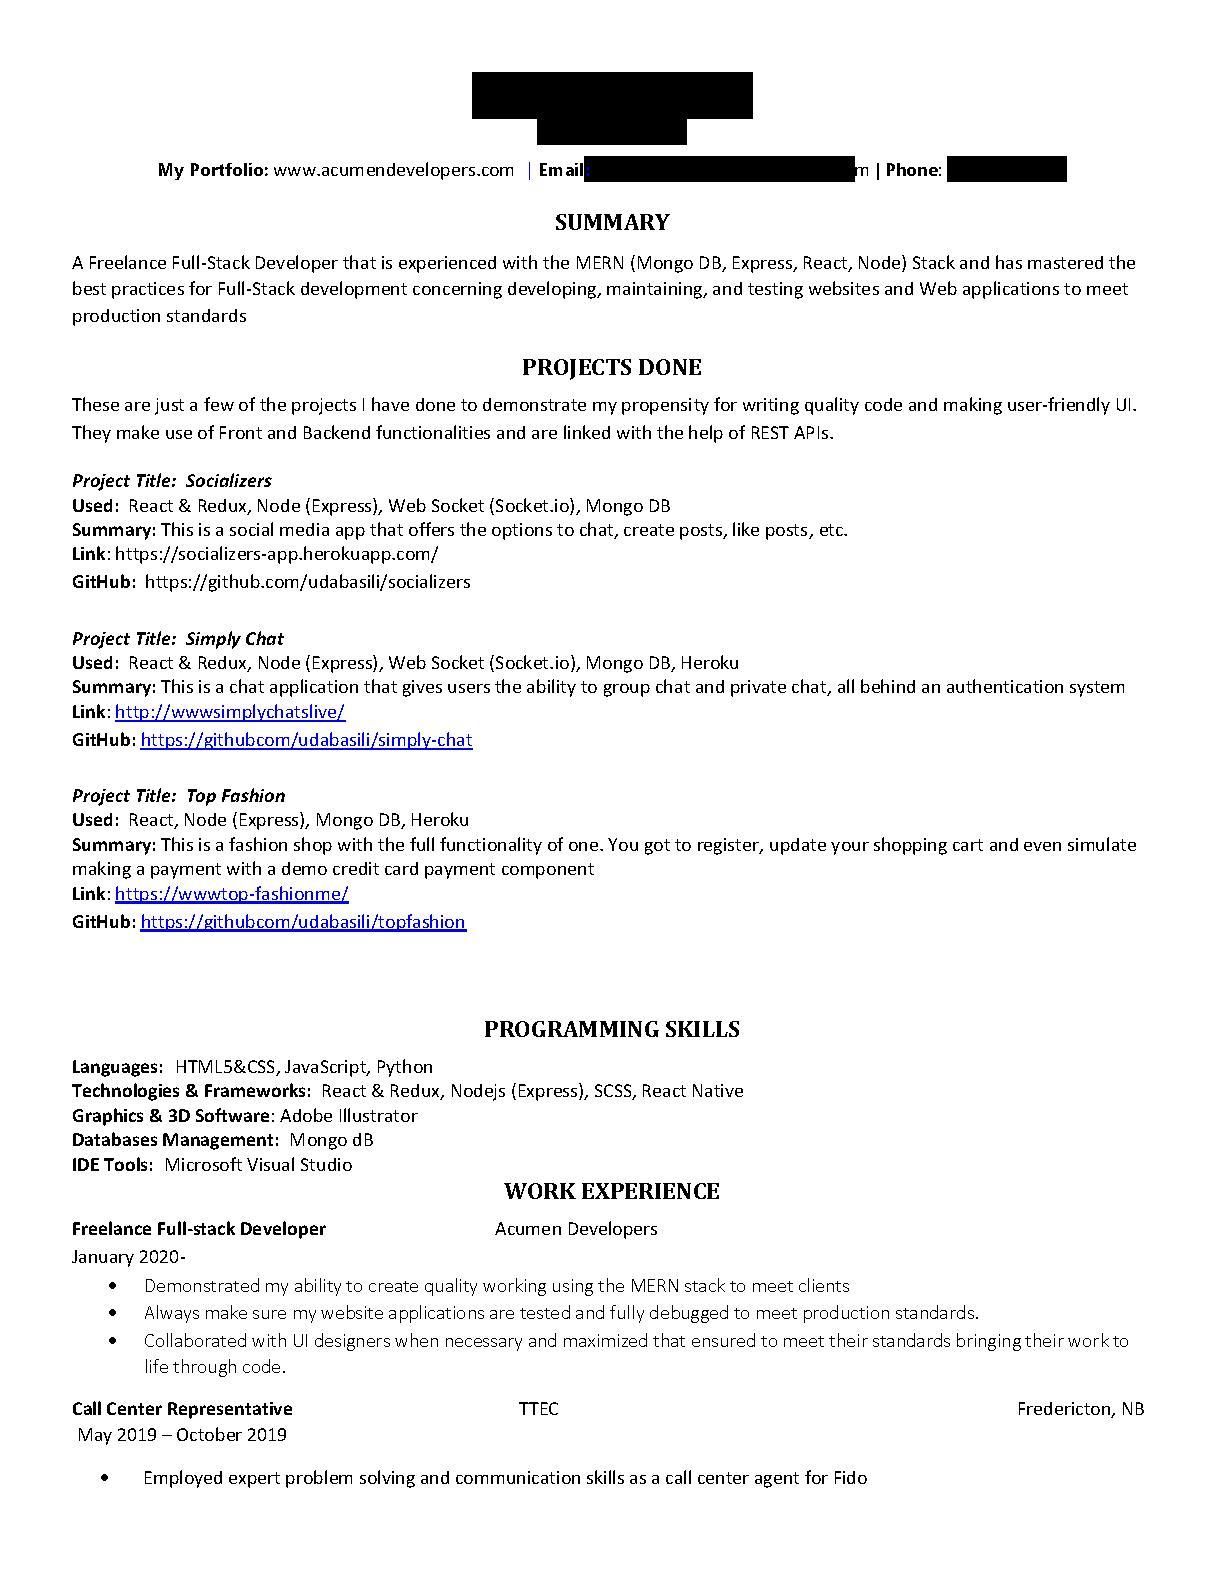 resumepdf  pdf host